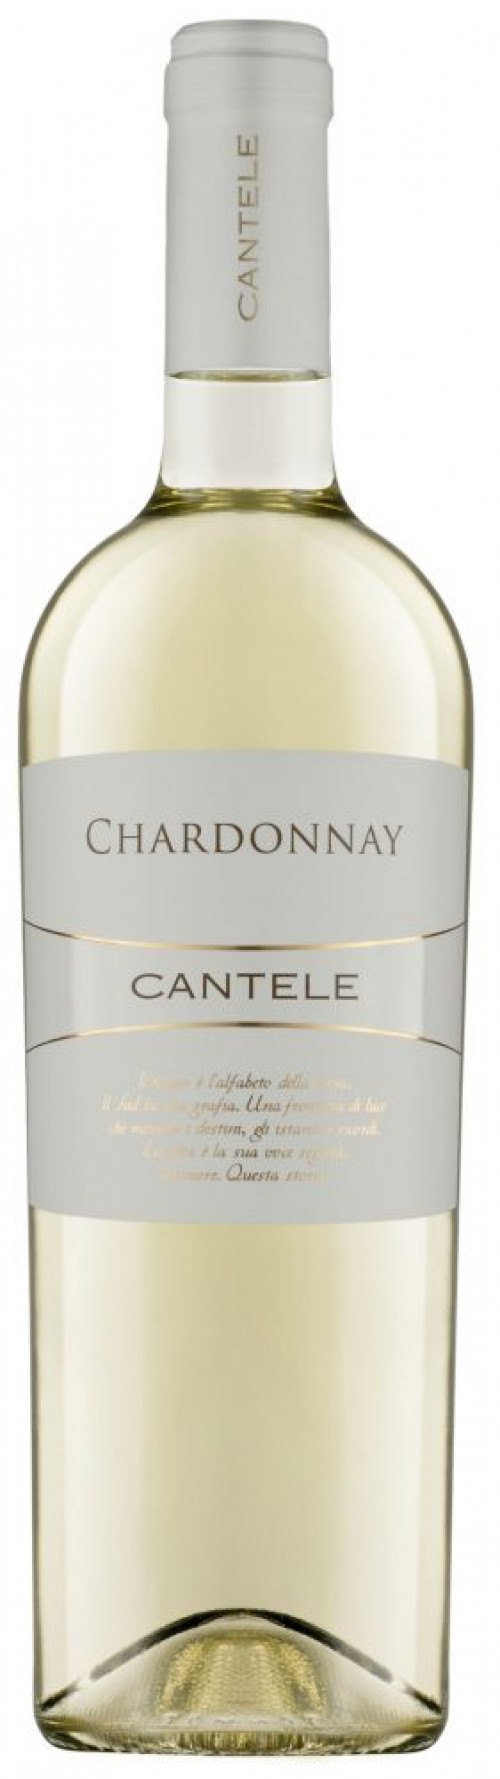 2018 Cantele Chardonnay Salento 750ml